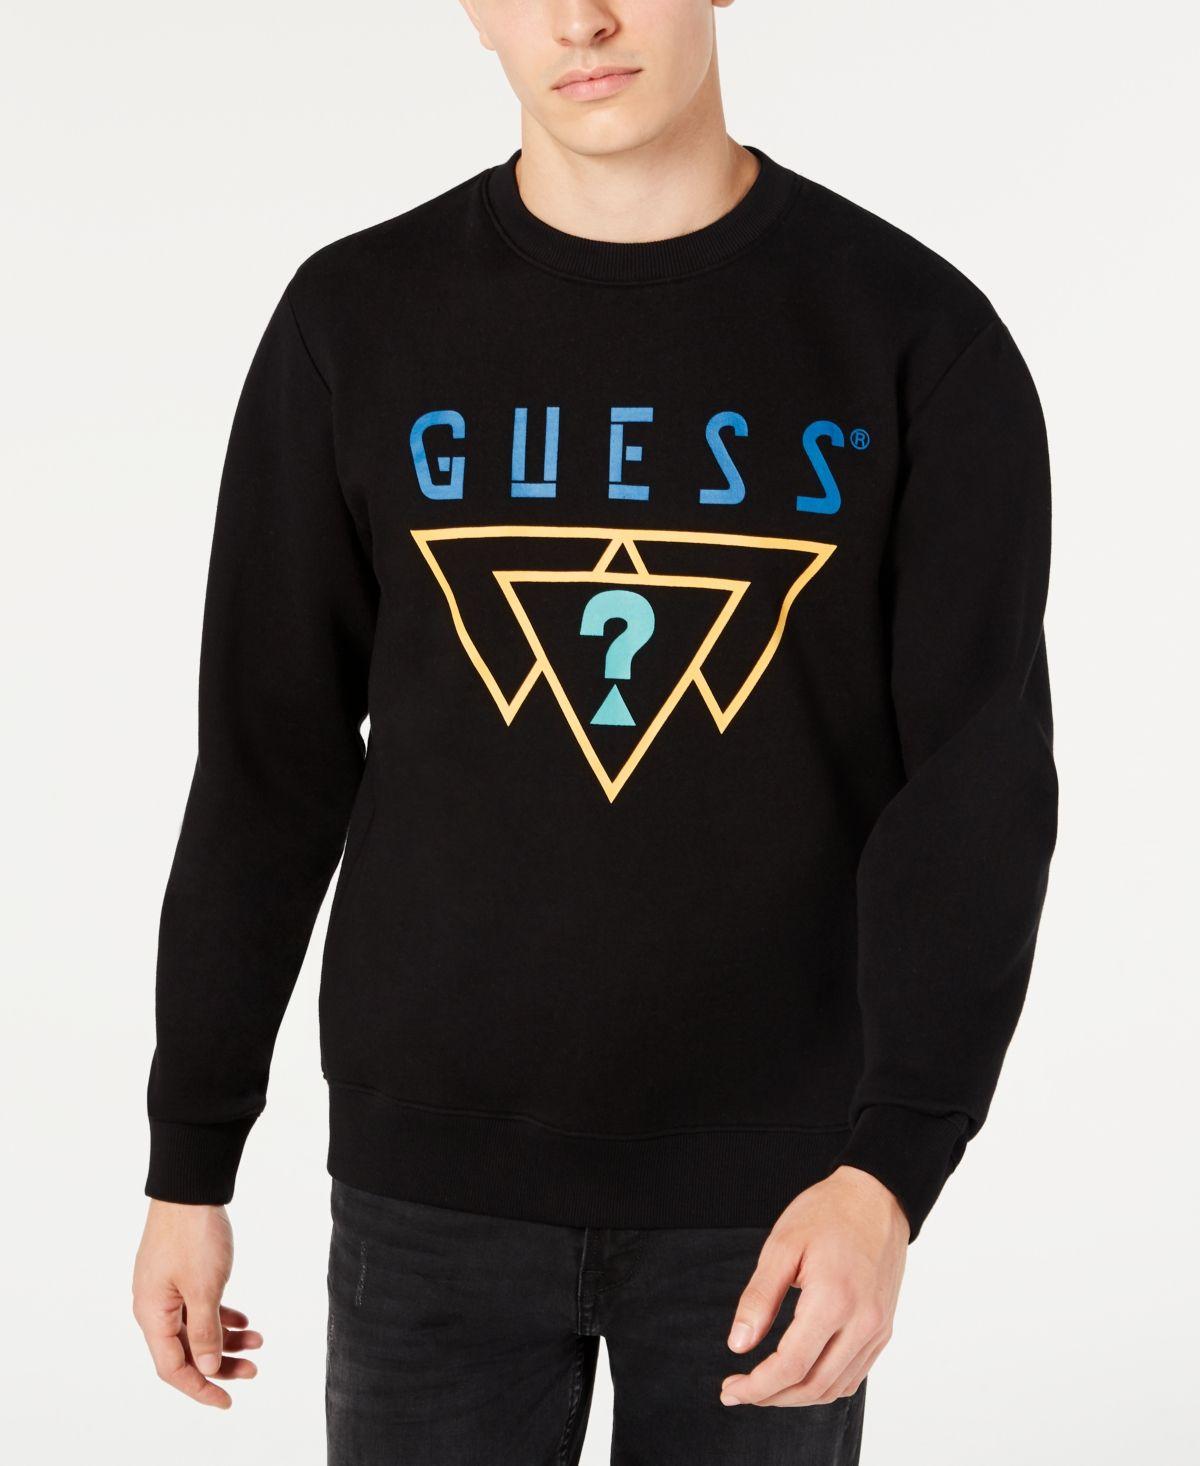 Guess Men S Logo Triangles Sweatshirt Jet Black Sweatshirts Mens Sweatshirts Guess Men [ 1466 x 1200 Pixel ]